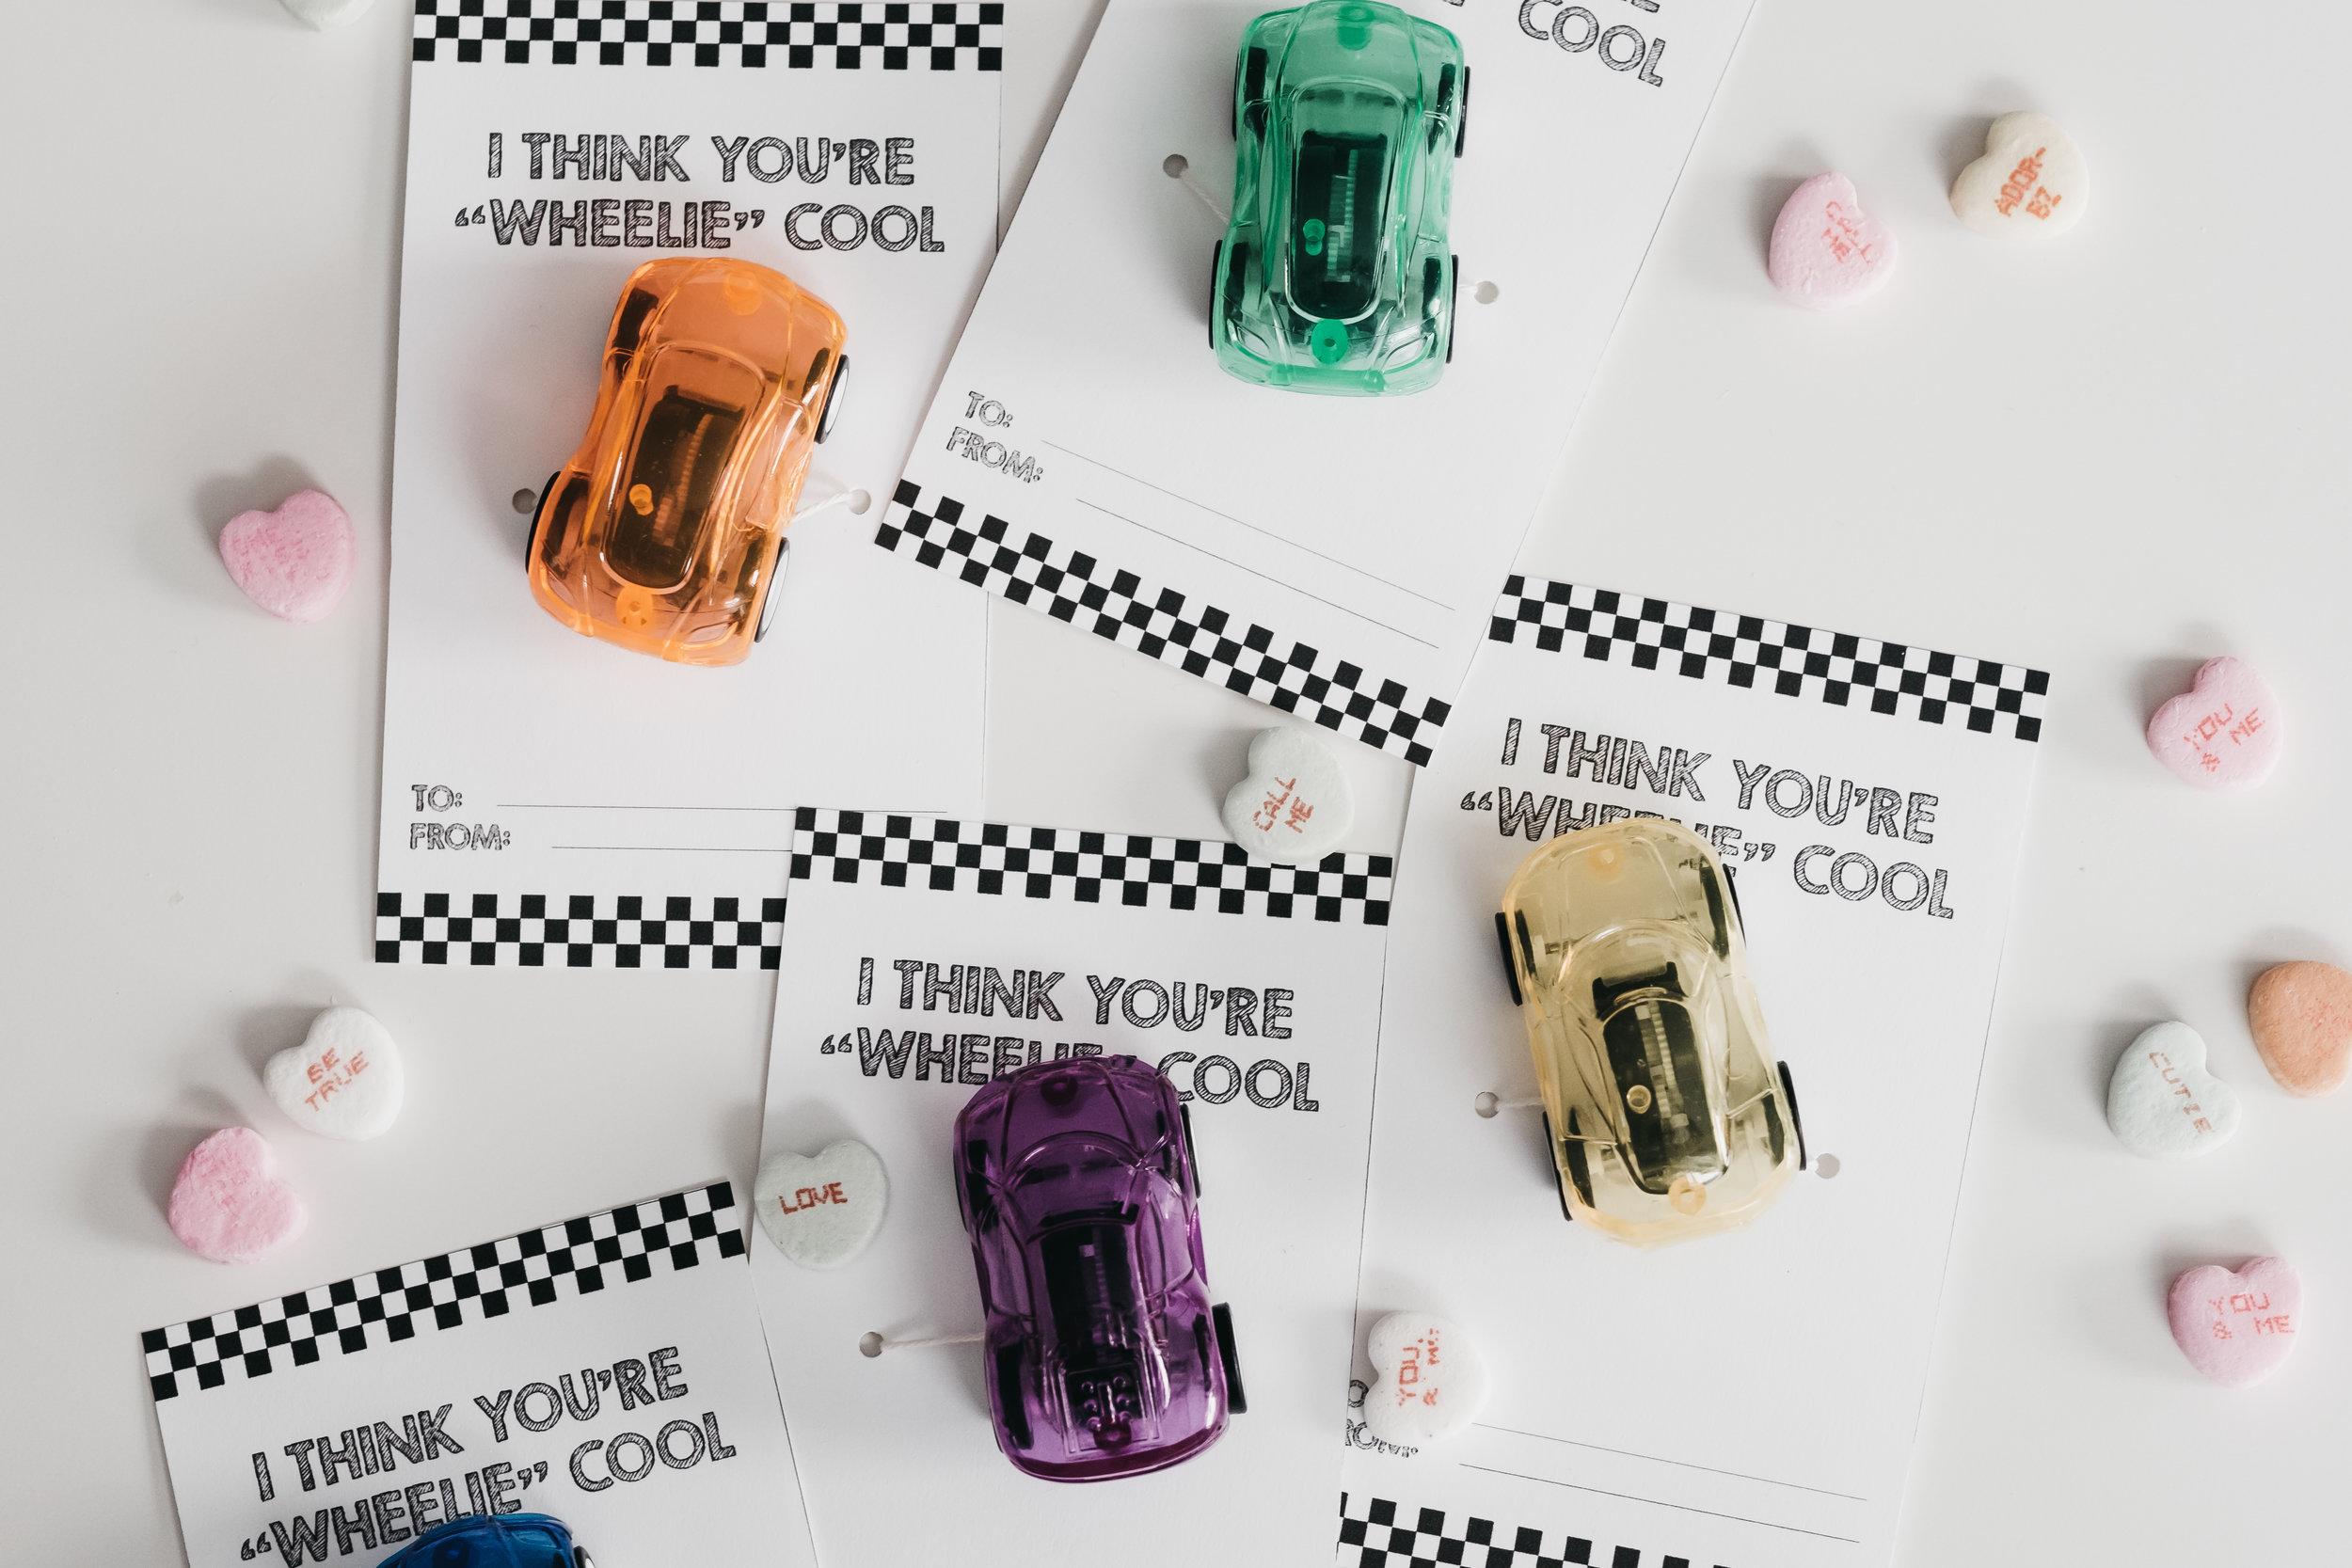 race car valantines day card diy-6.jpg